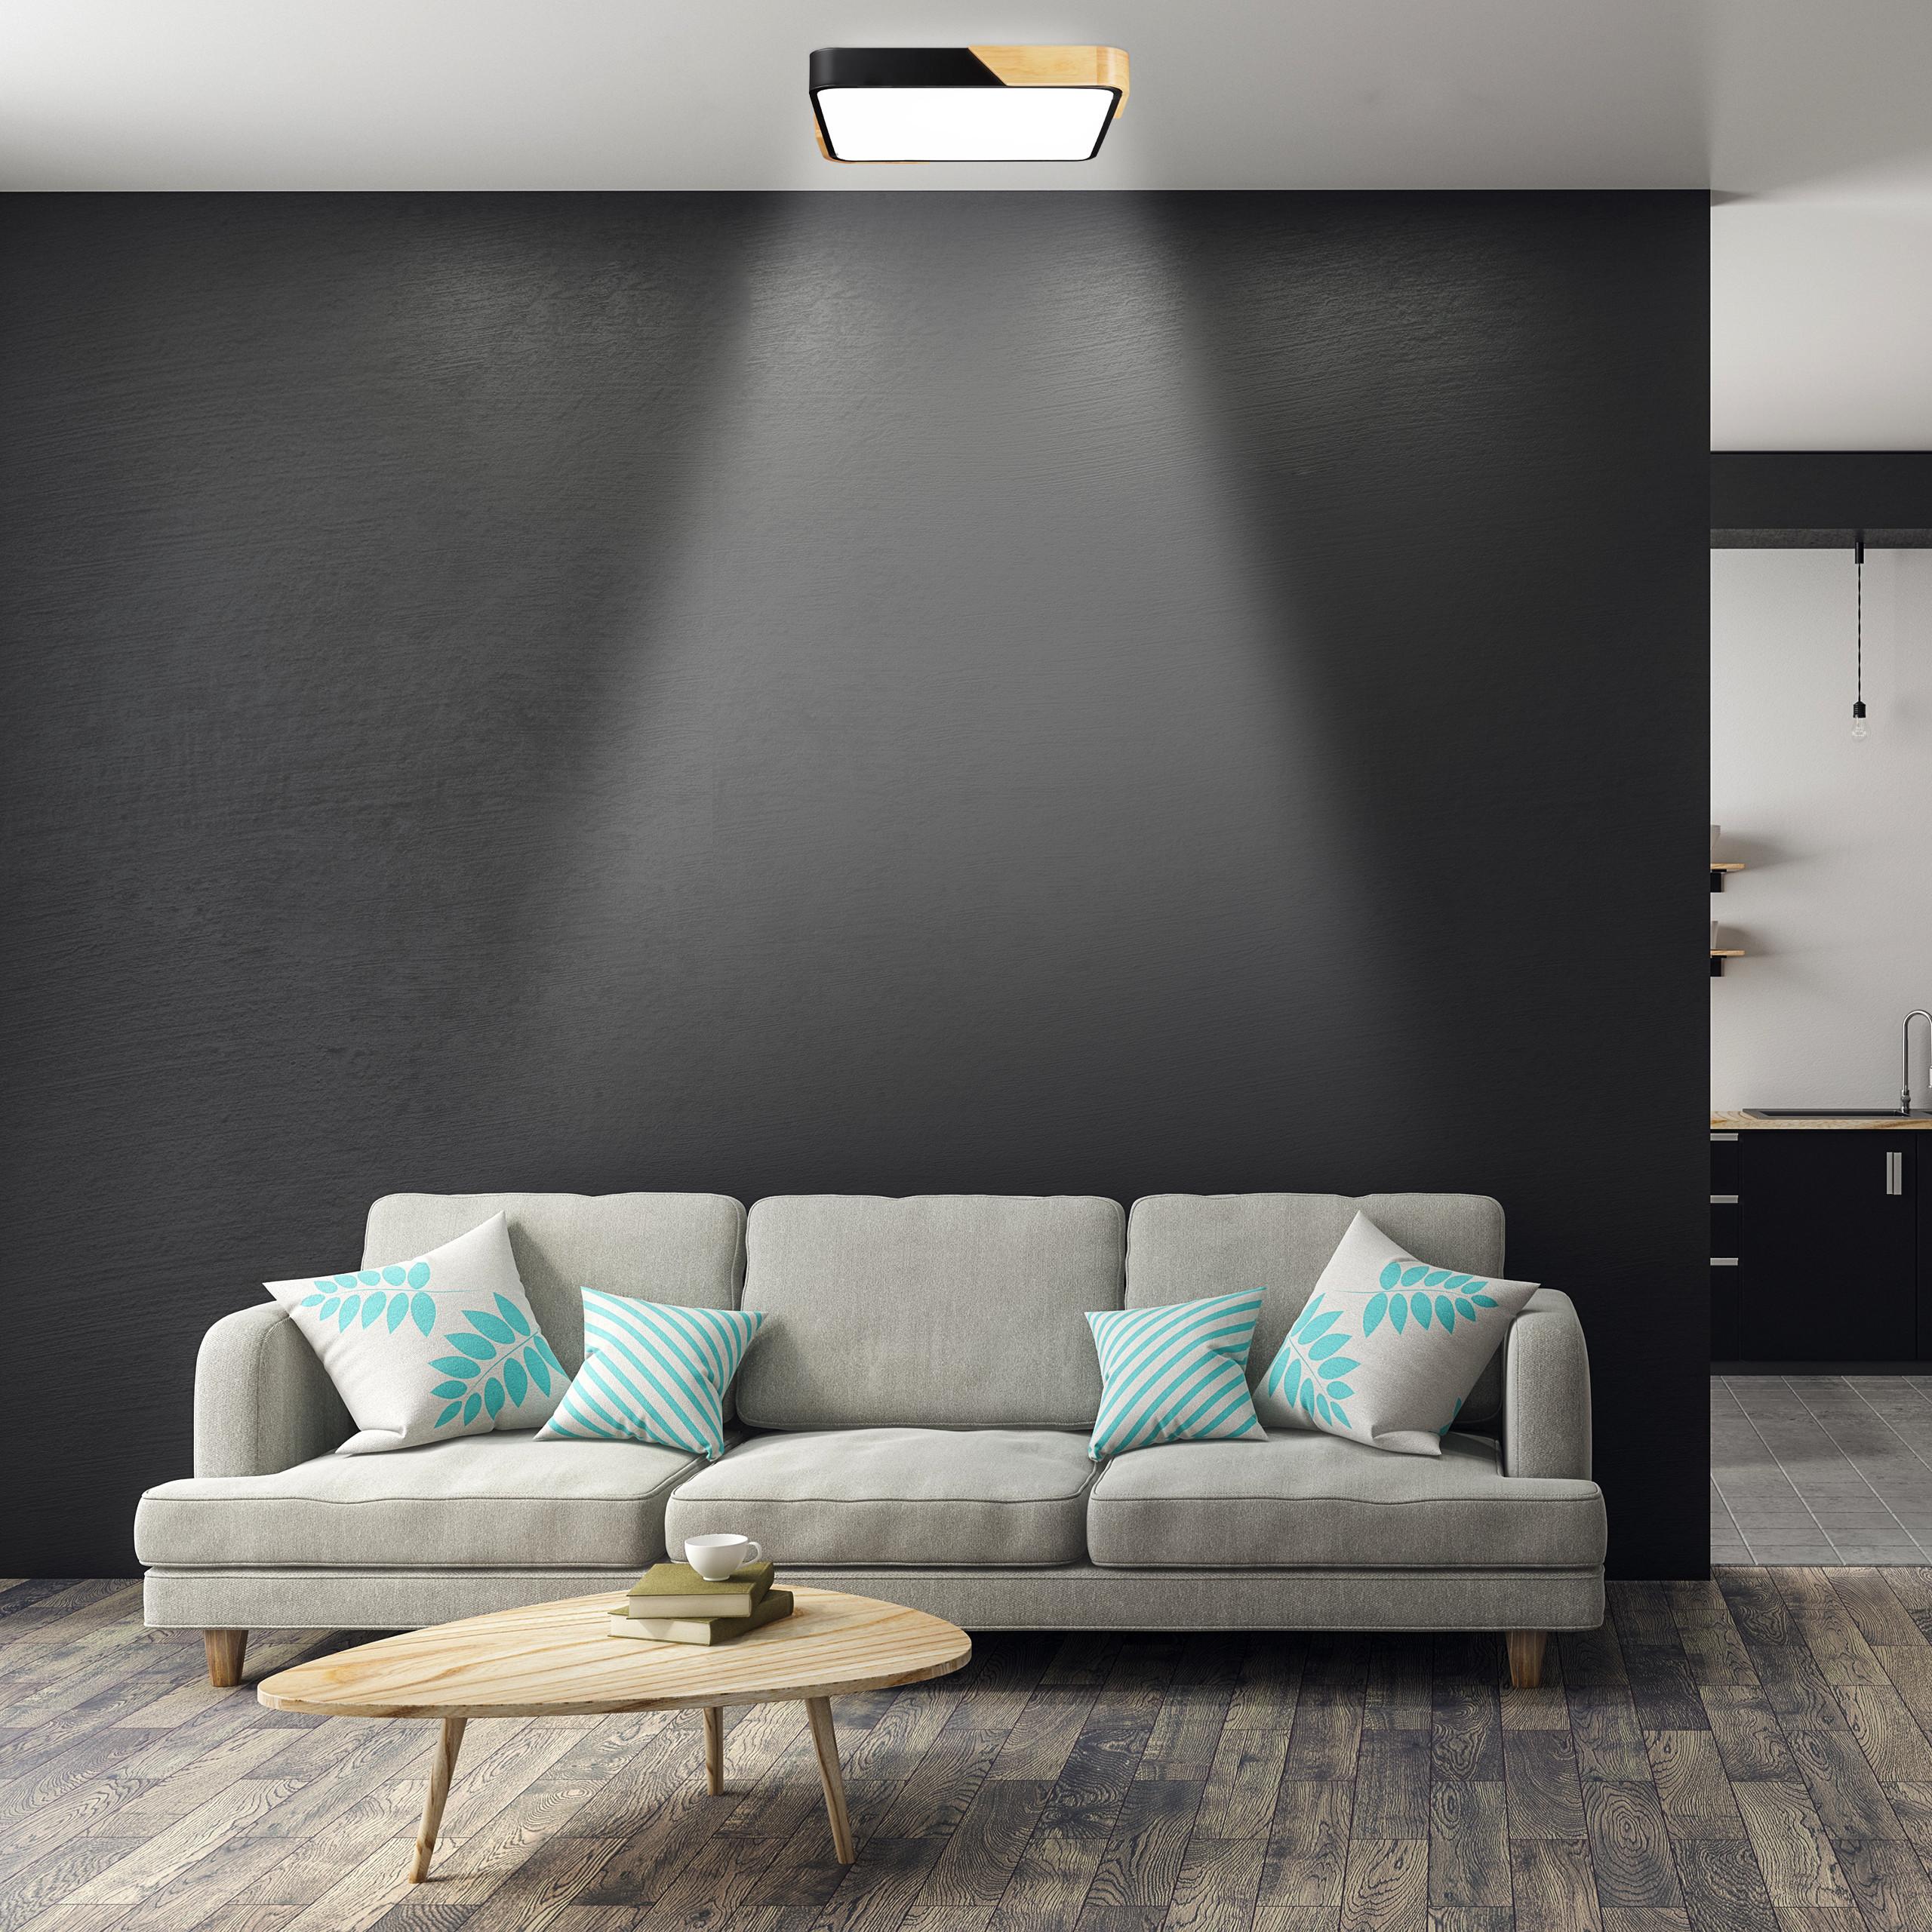 LED Deckenleuchte 24 W LED Lampe Deckenlampe Quadratisch Flurlampe Holz Metall